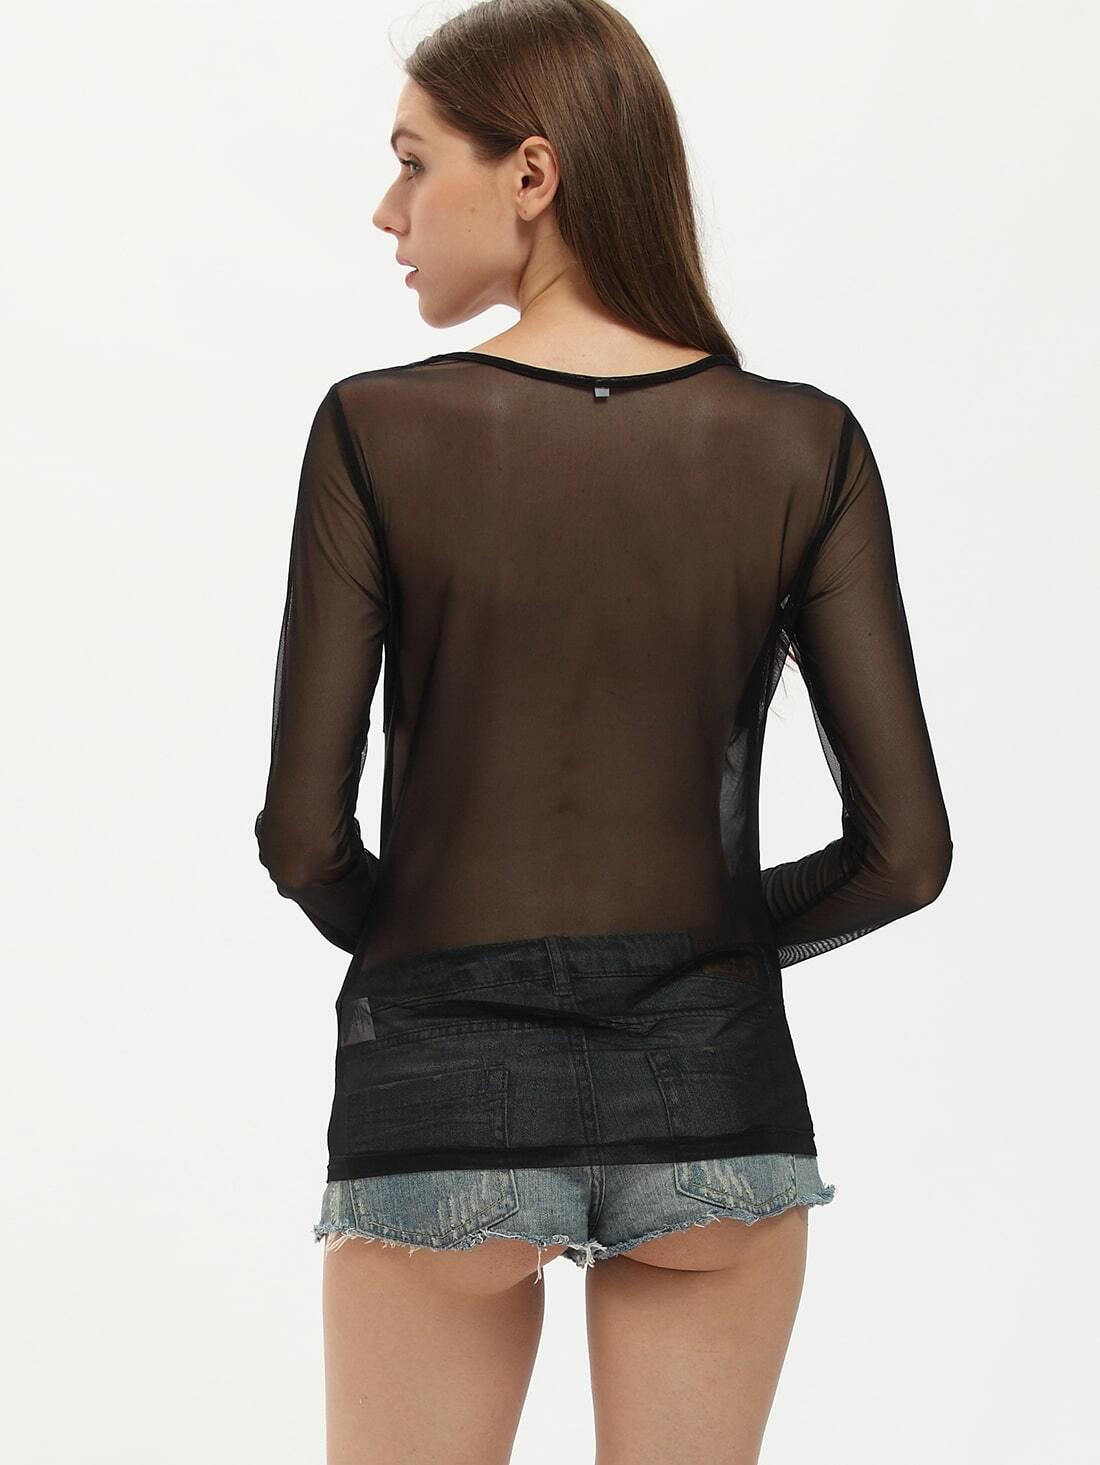 Long Sleeve Sheer Black Blouse 89